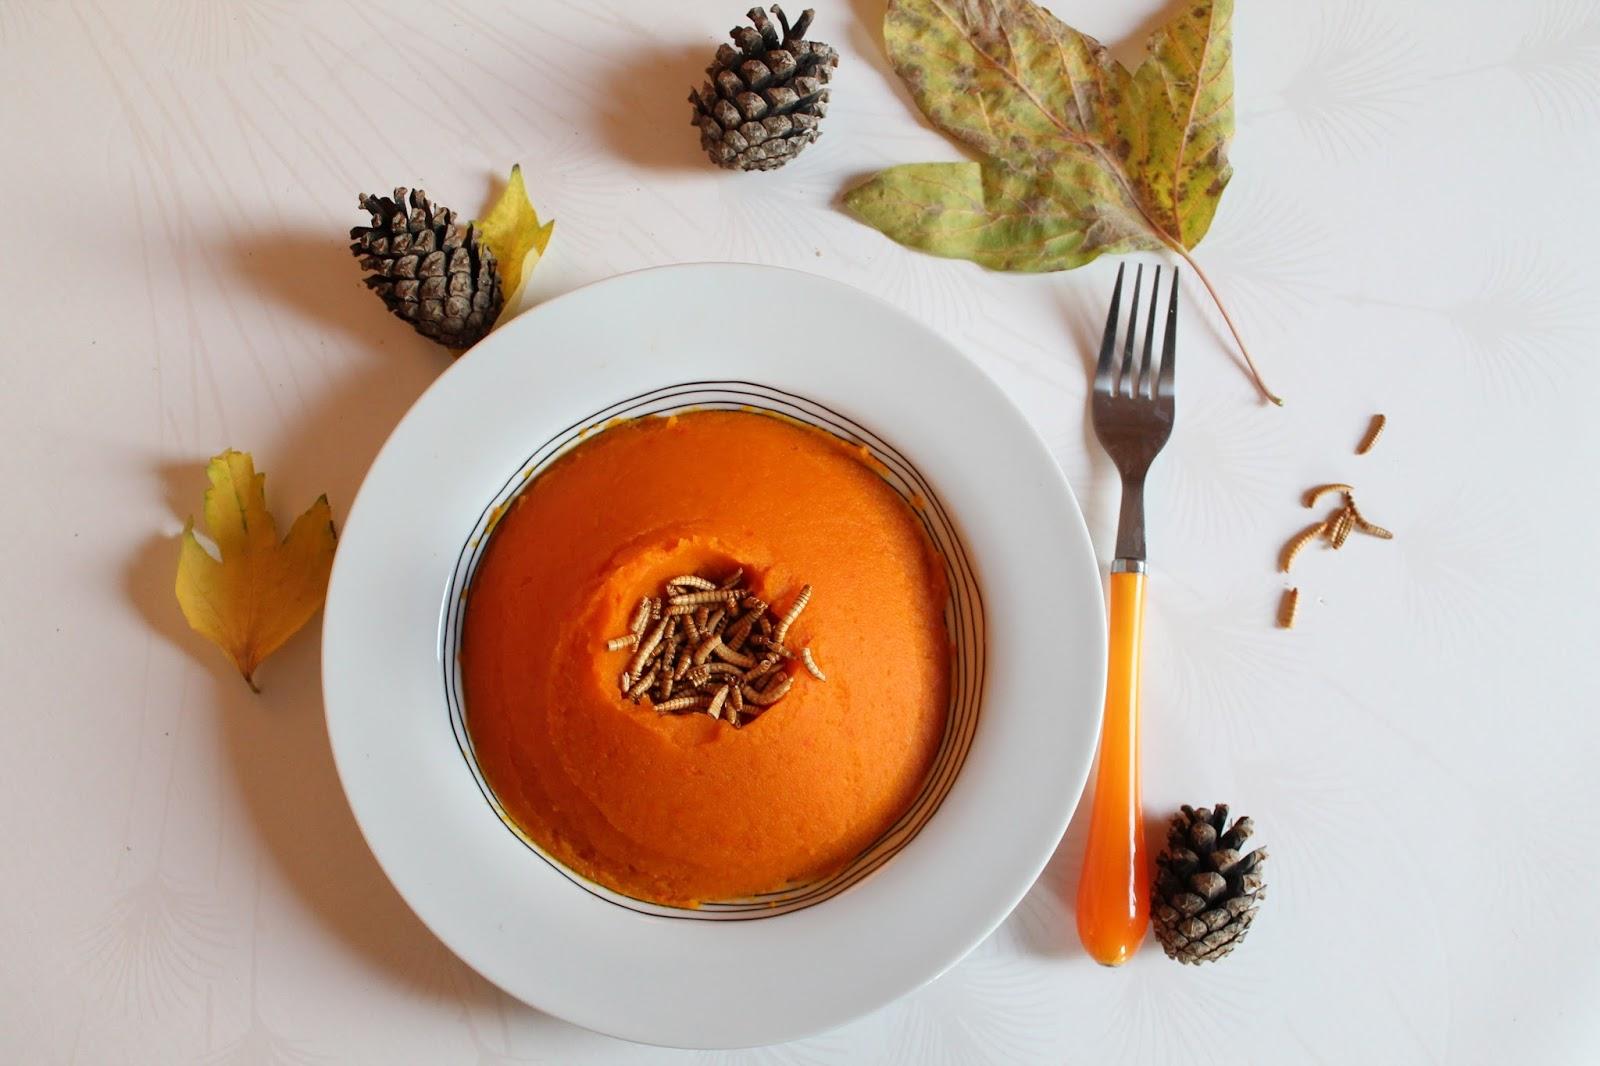 jimini's cuisiner insectes molitors purée potiron potimarron